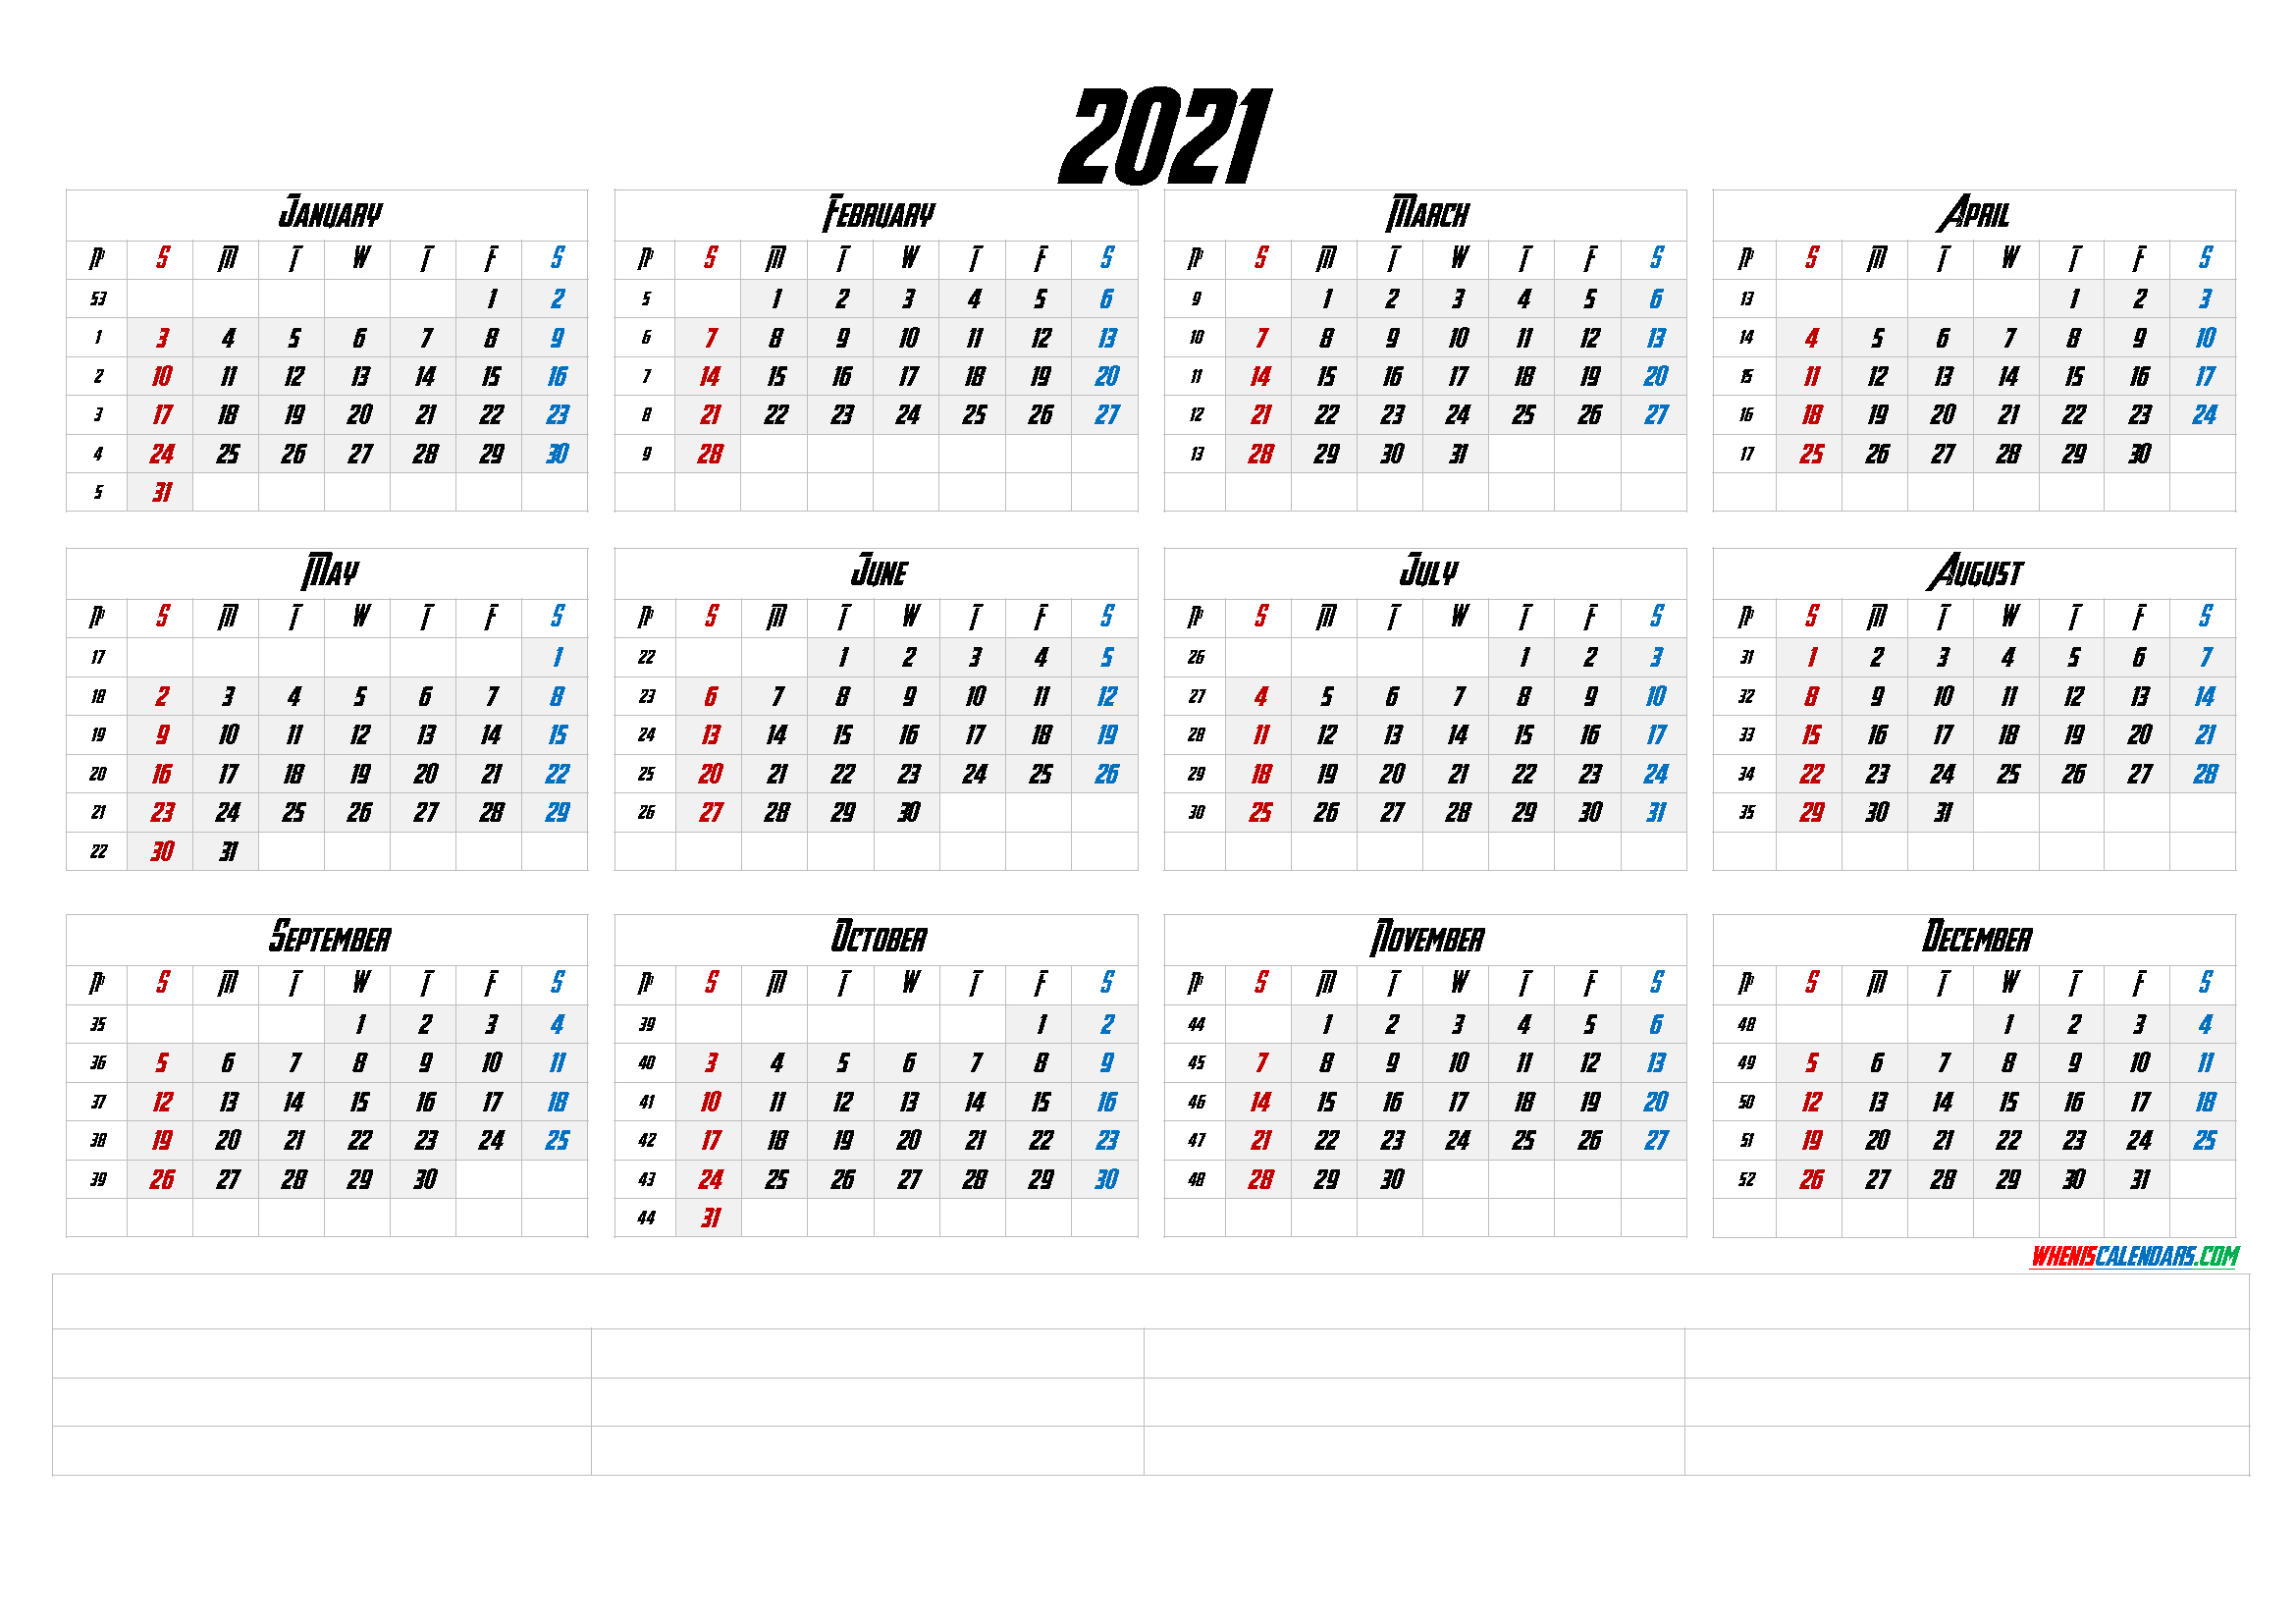 12 Month Calendar Printable 2021 (6 Templates) inside 2021 Writable Calendars By Month